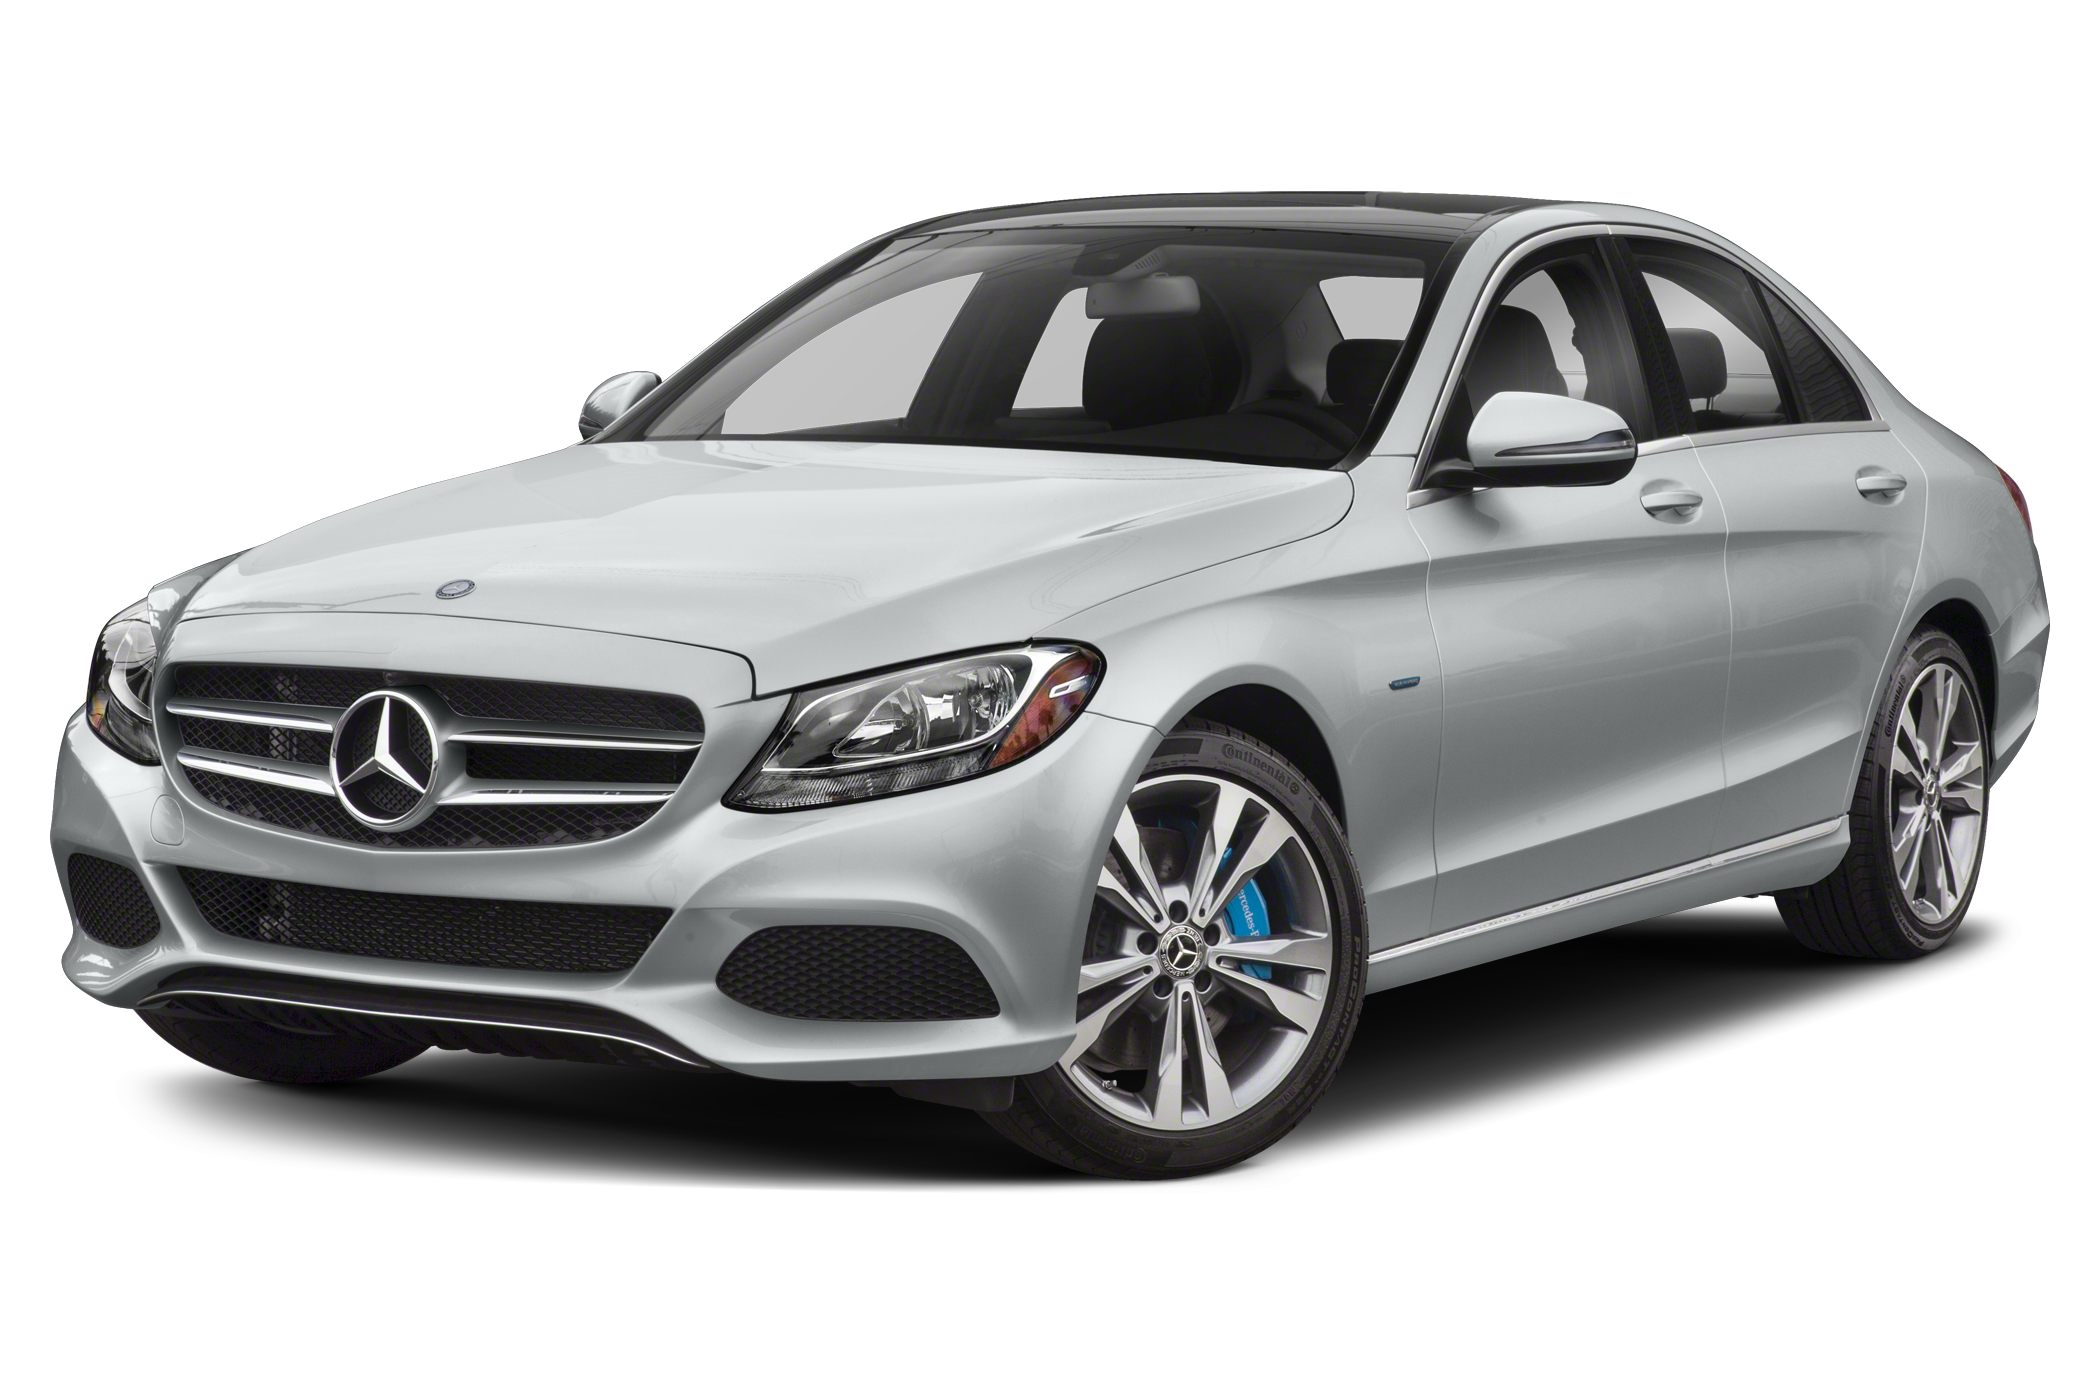 Silver Crosstrek 2018 >> 2016 BMW 330e Plug-In Hybrid First Drive - Autoblog